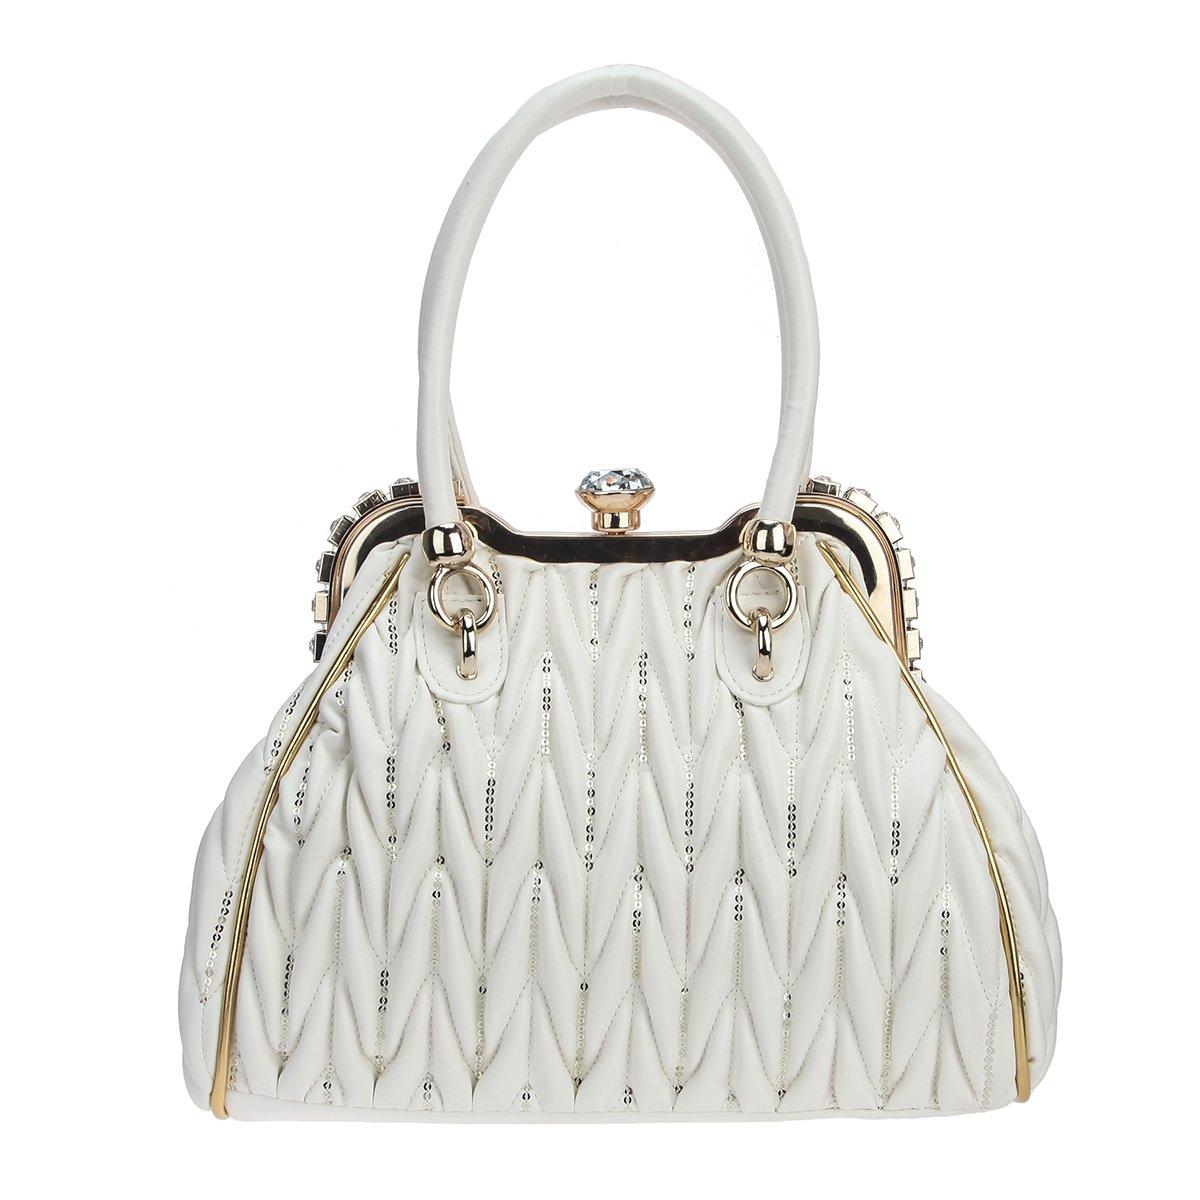 Fawziya Big Crystal Sequins Tote Bag For Women Shoulder Handbag With Pockets-White